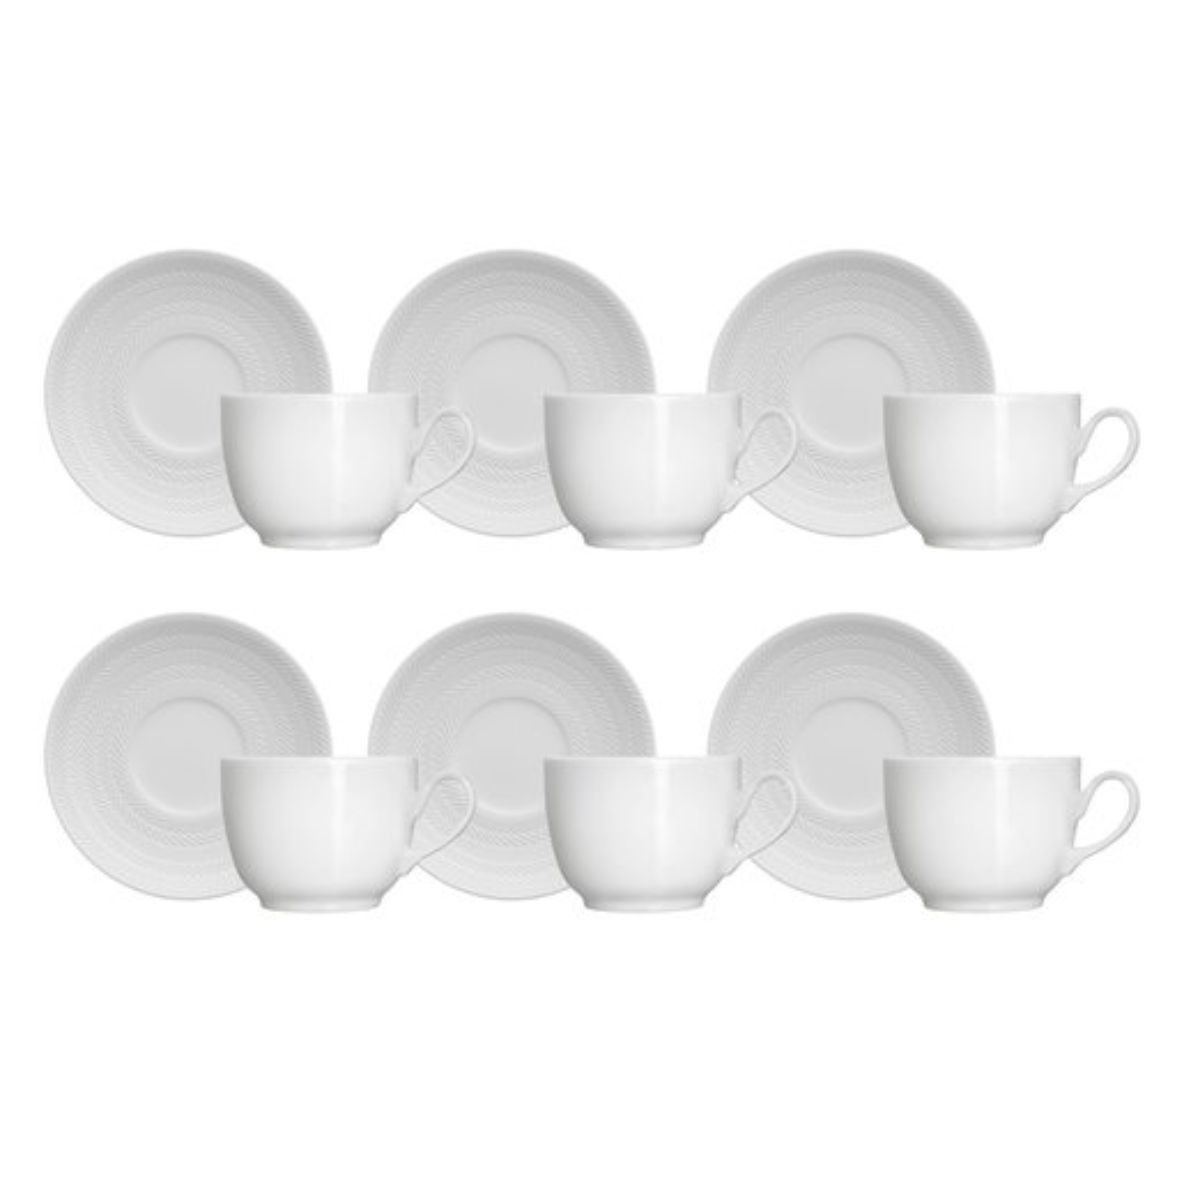 Conjunto de Chá 12 Peças Branco 200 ml - Biona